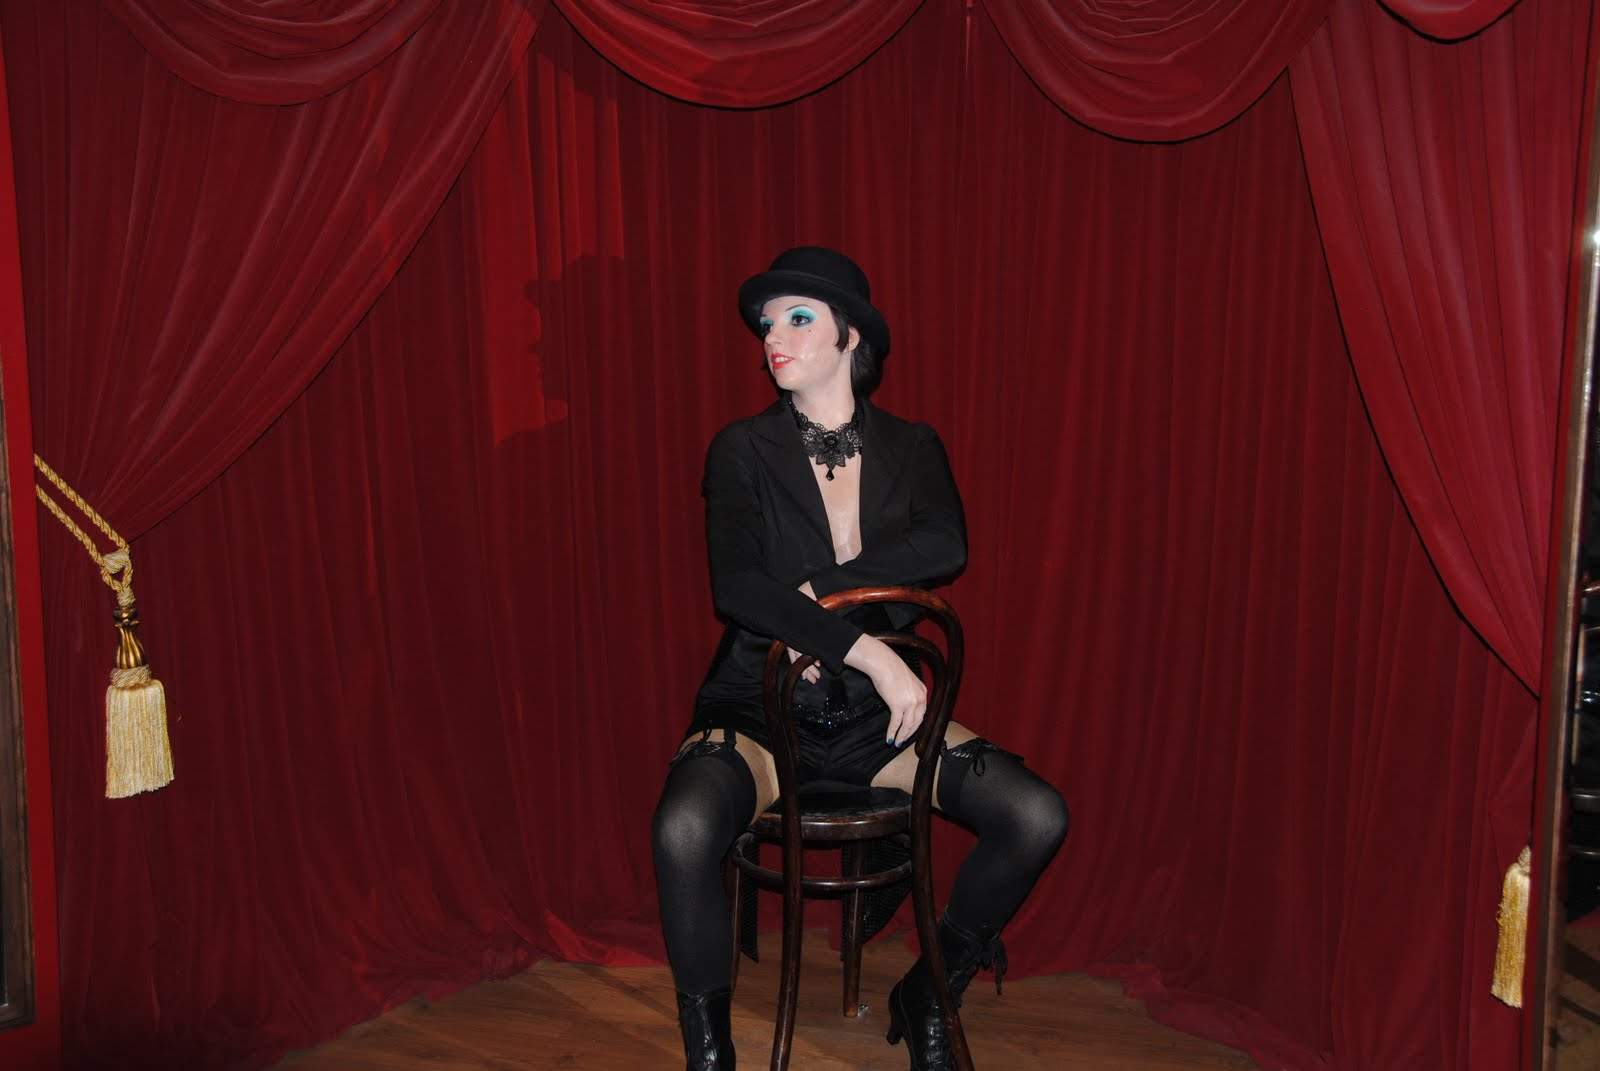 fotos ausschnitt madame tussauds berlin. Black Bedroom Furniture Sets. Home Design Ideas